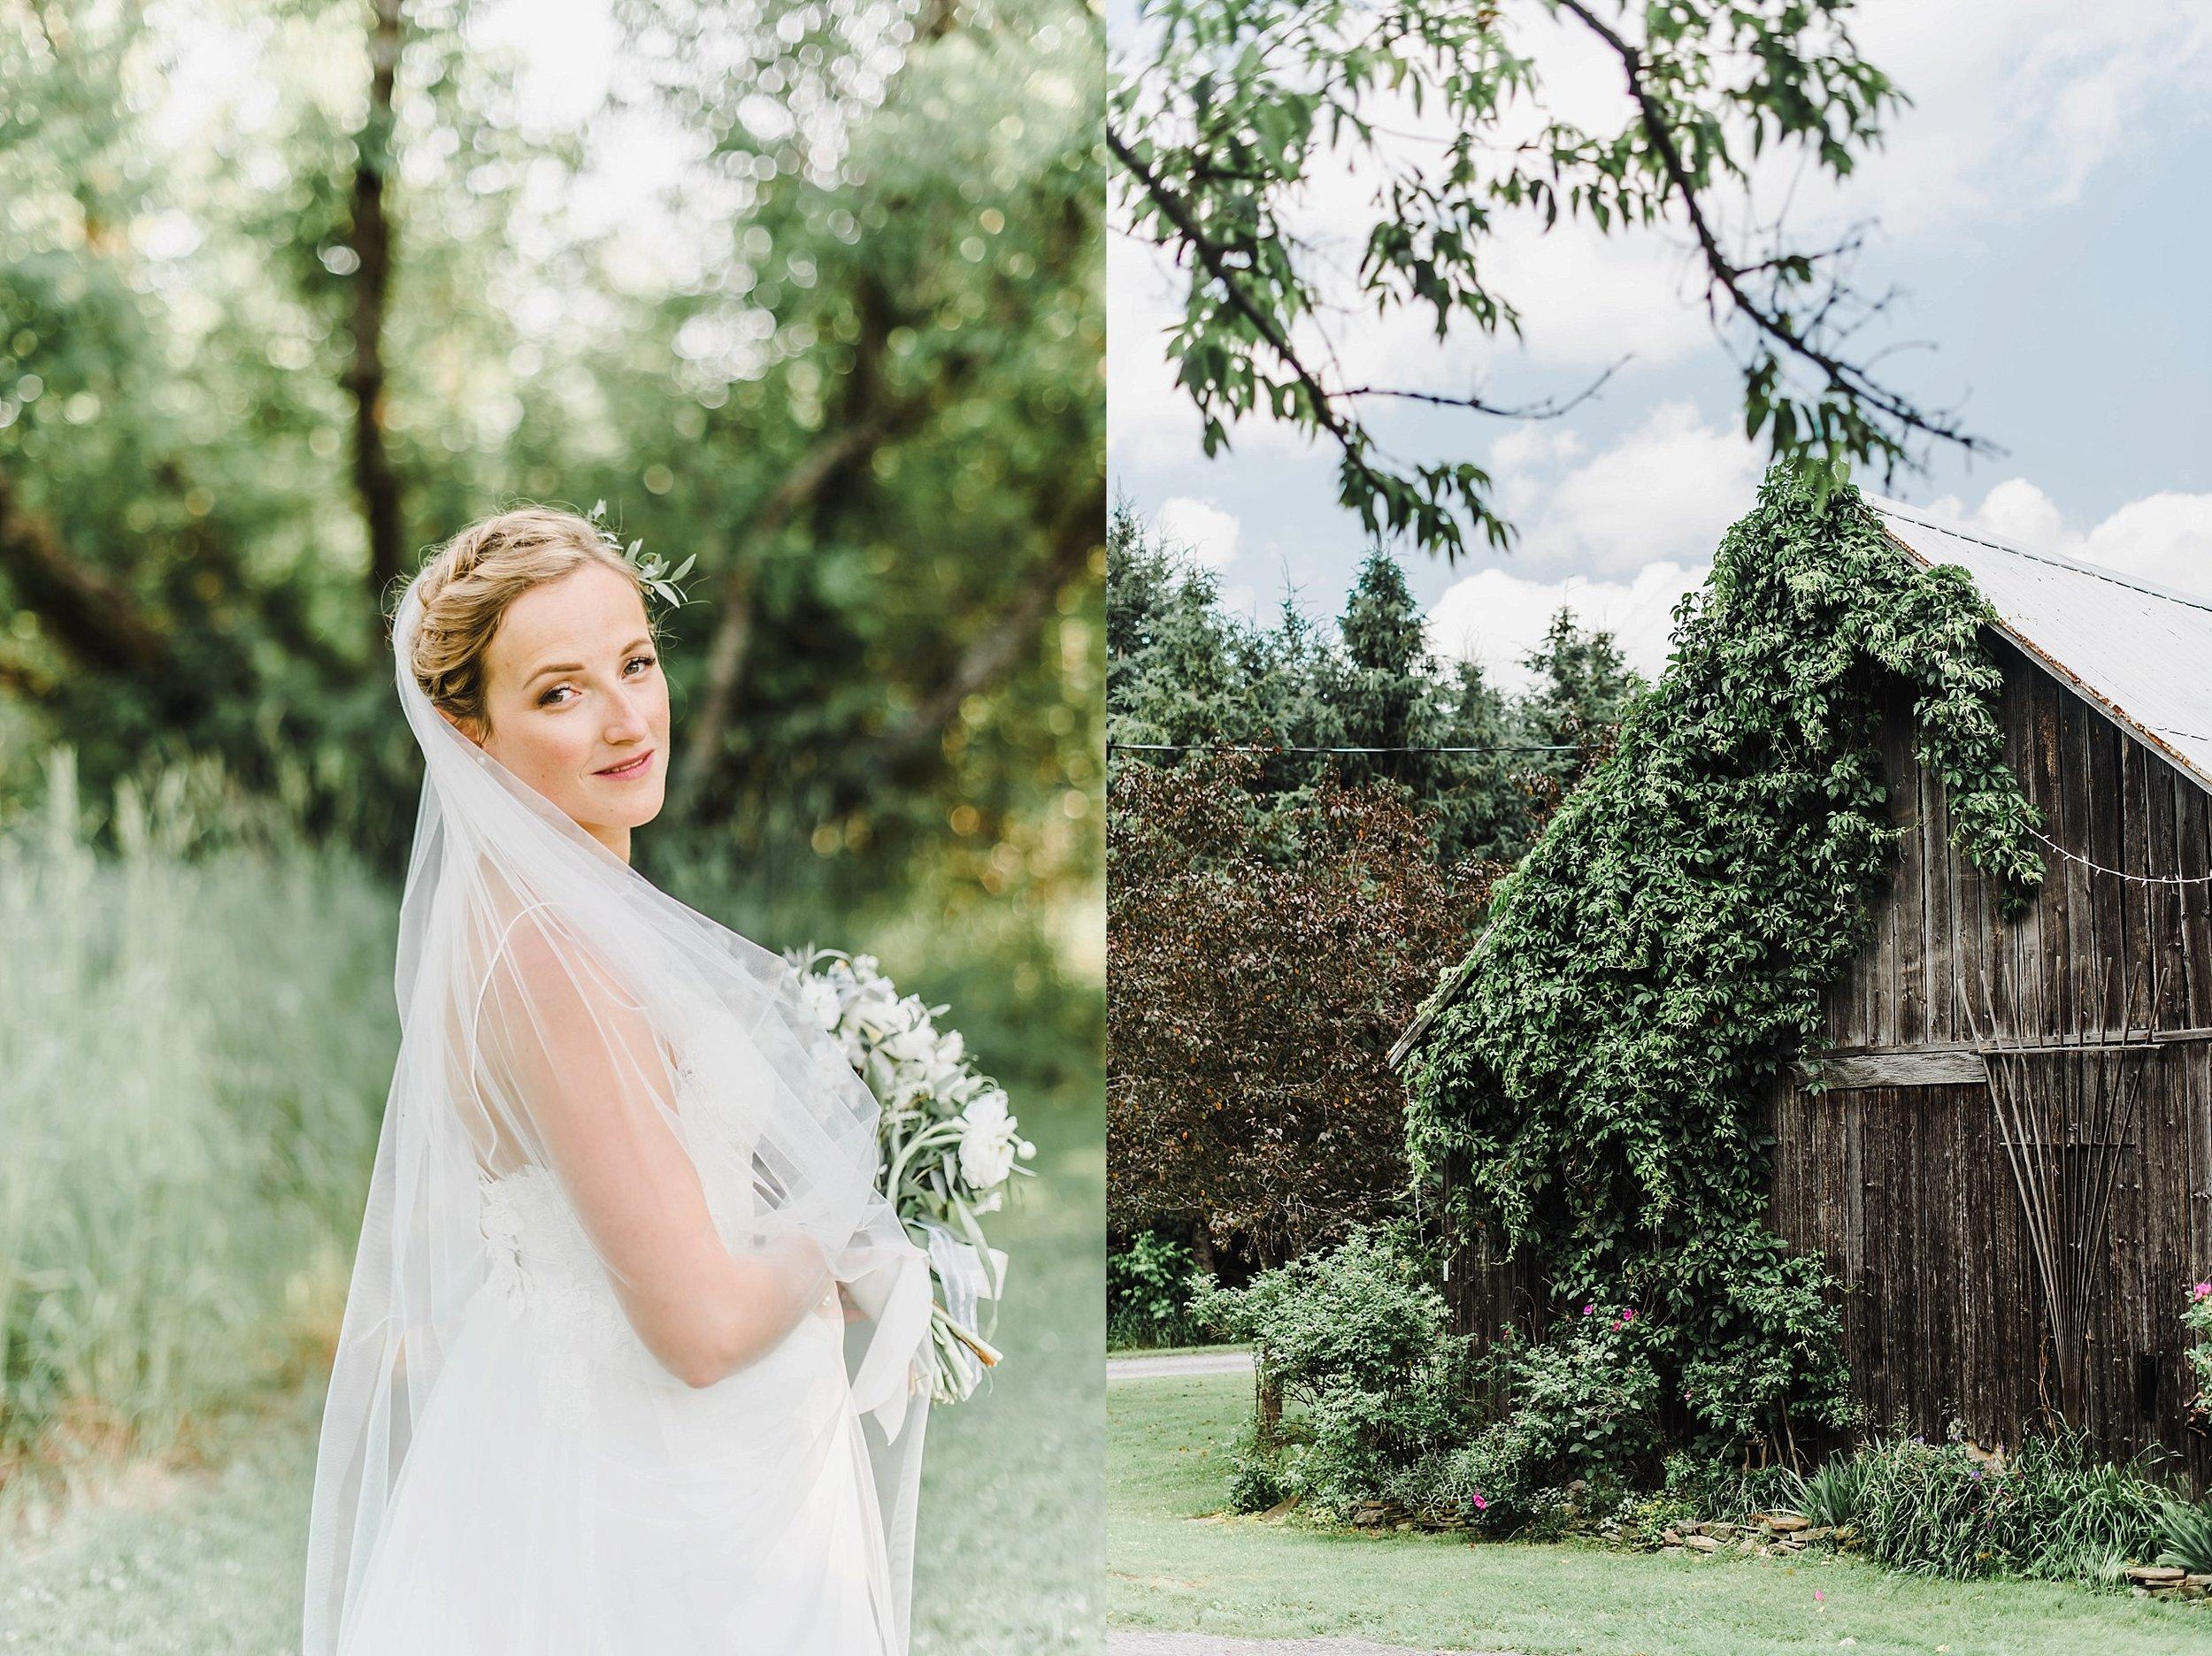 light airy indie fine art ottawa wedding photographer | Ali and Batoul Photography_0865.jpg